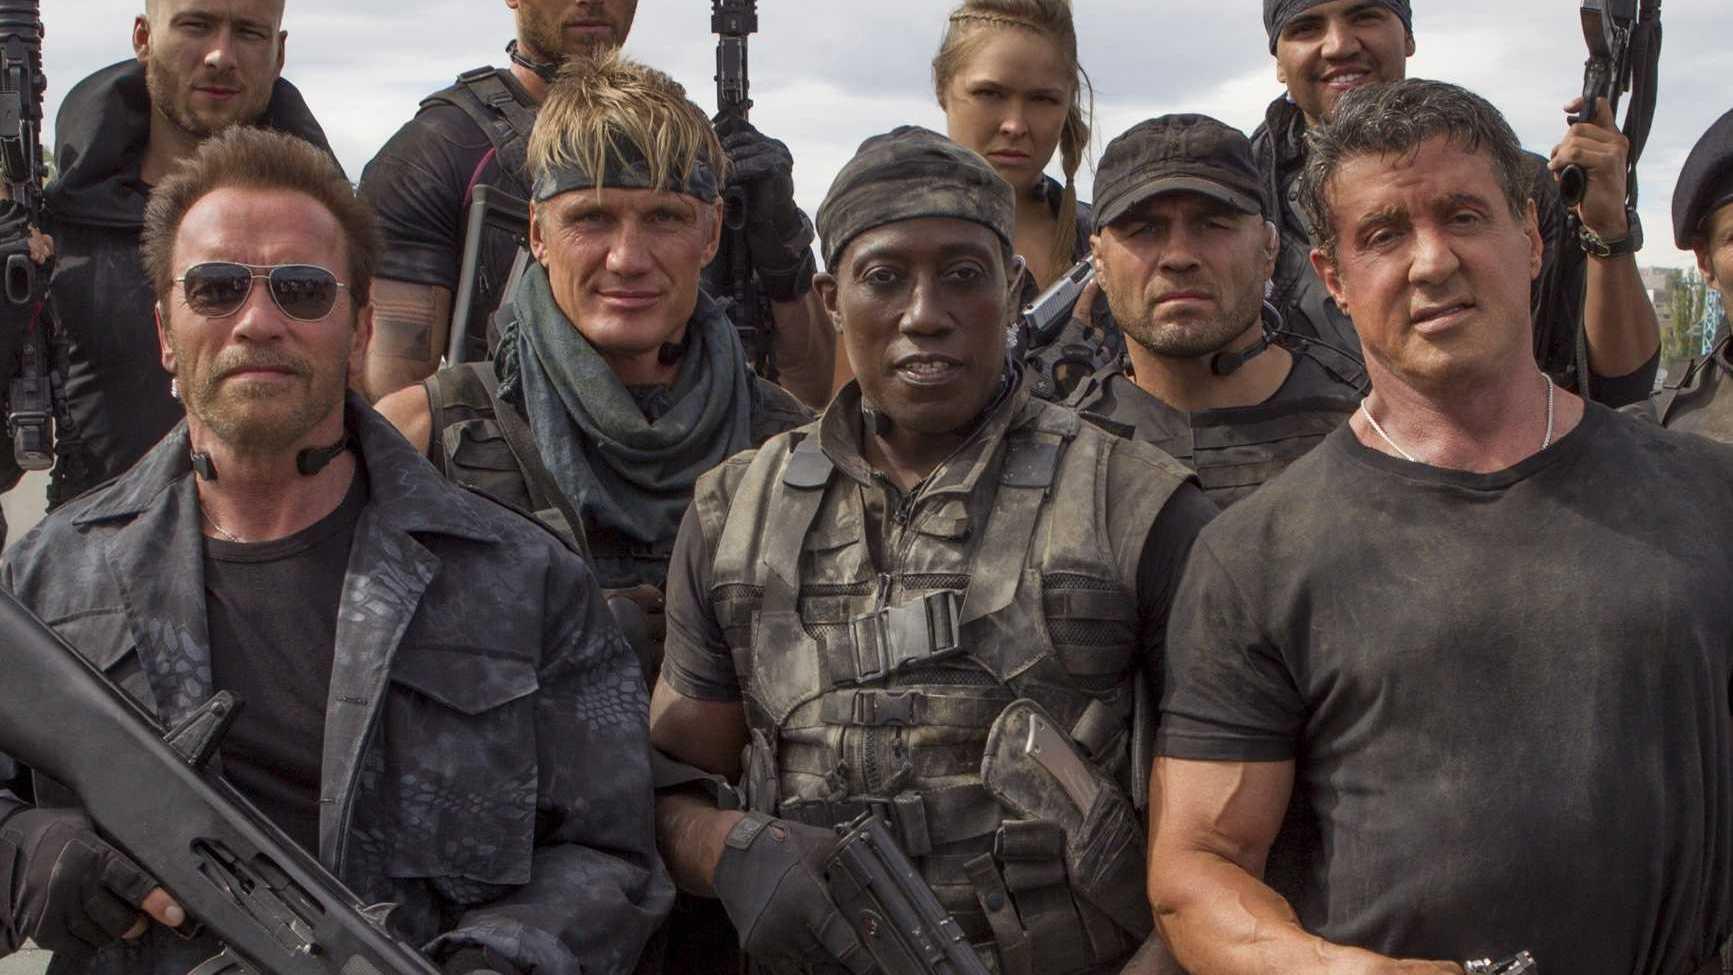 Lionsgate stapt naar de rechter wegens lek 'The Expendables 3'